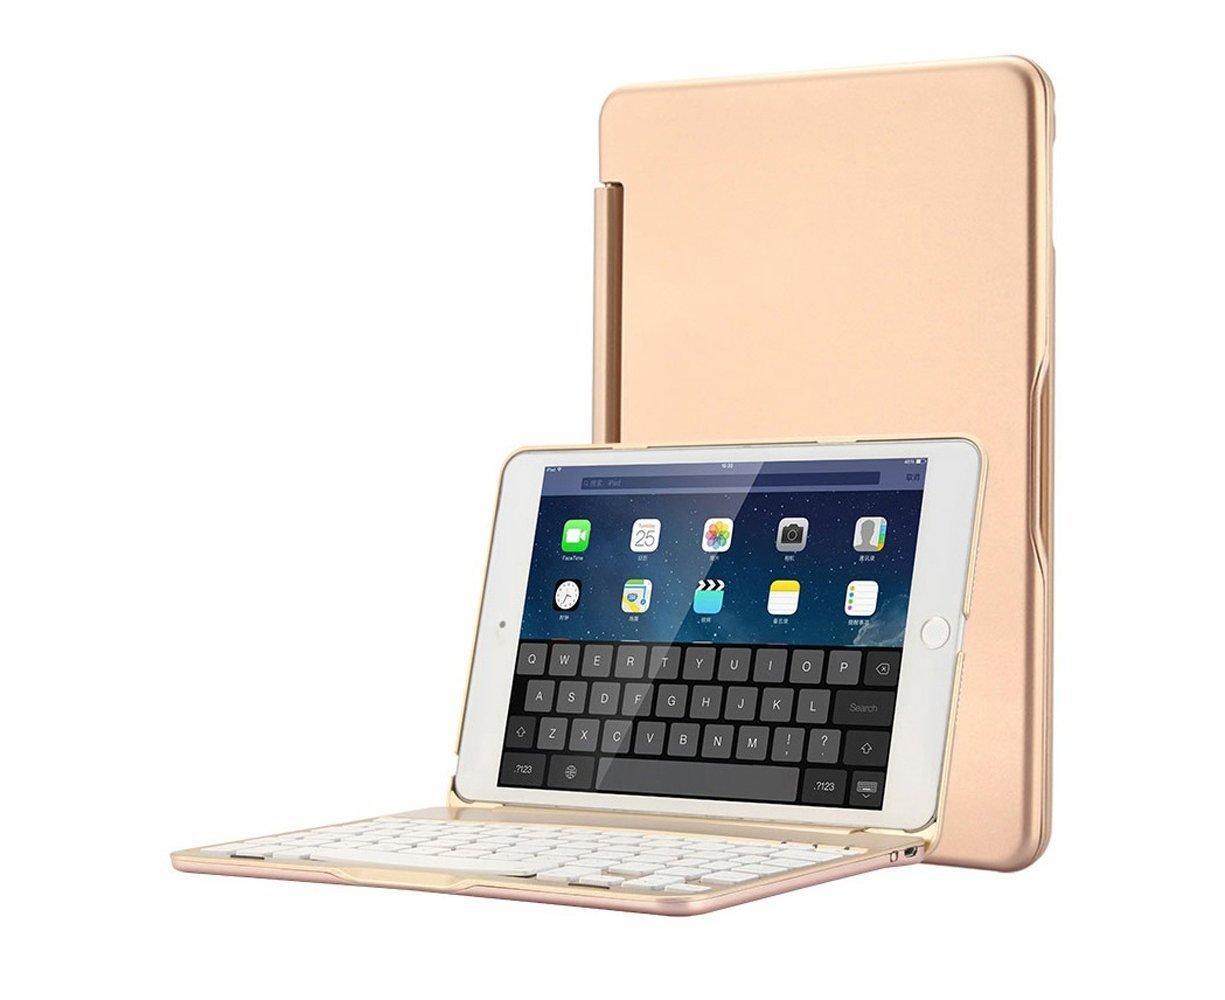 Bàn phím Bluetooth PKCB F8S cho iPad Mini 4 PKCB-BANPHIM